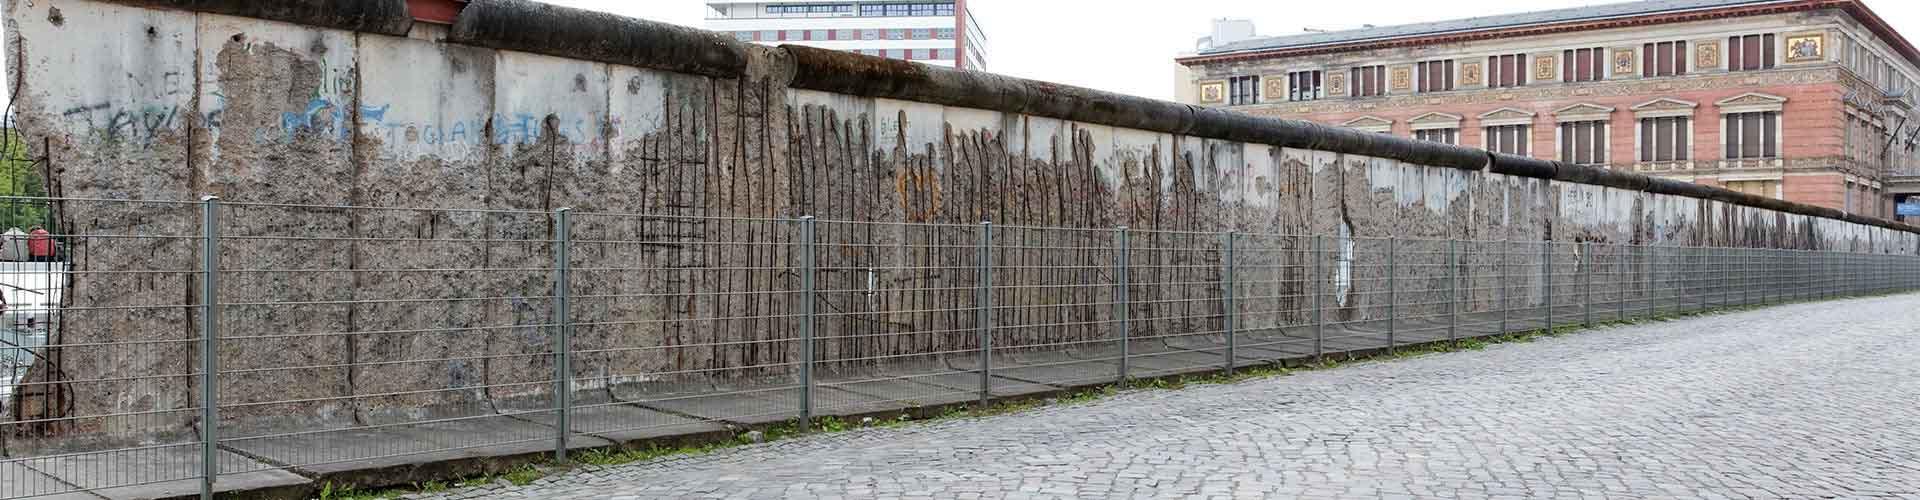 Berlín - Hostales cerca a Muro de Berlín. Mapas de Berlín, Fotos y comentarios de cada Hostal en Berlín.